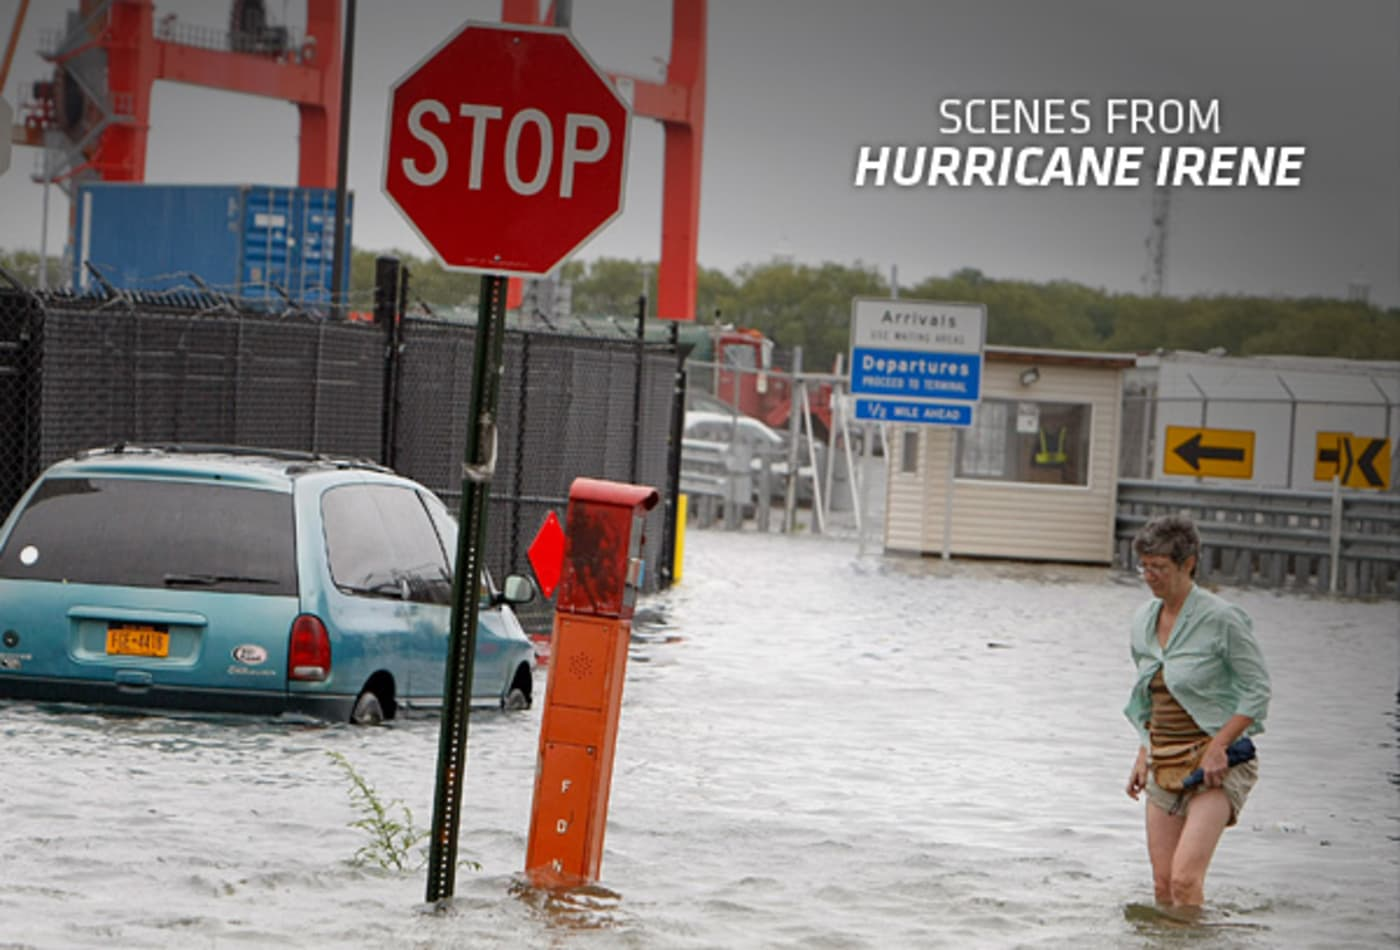 CNBC_Scenes_Irene_COVER3.jpg